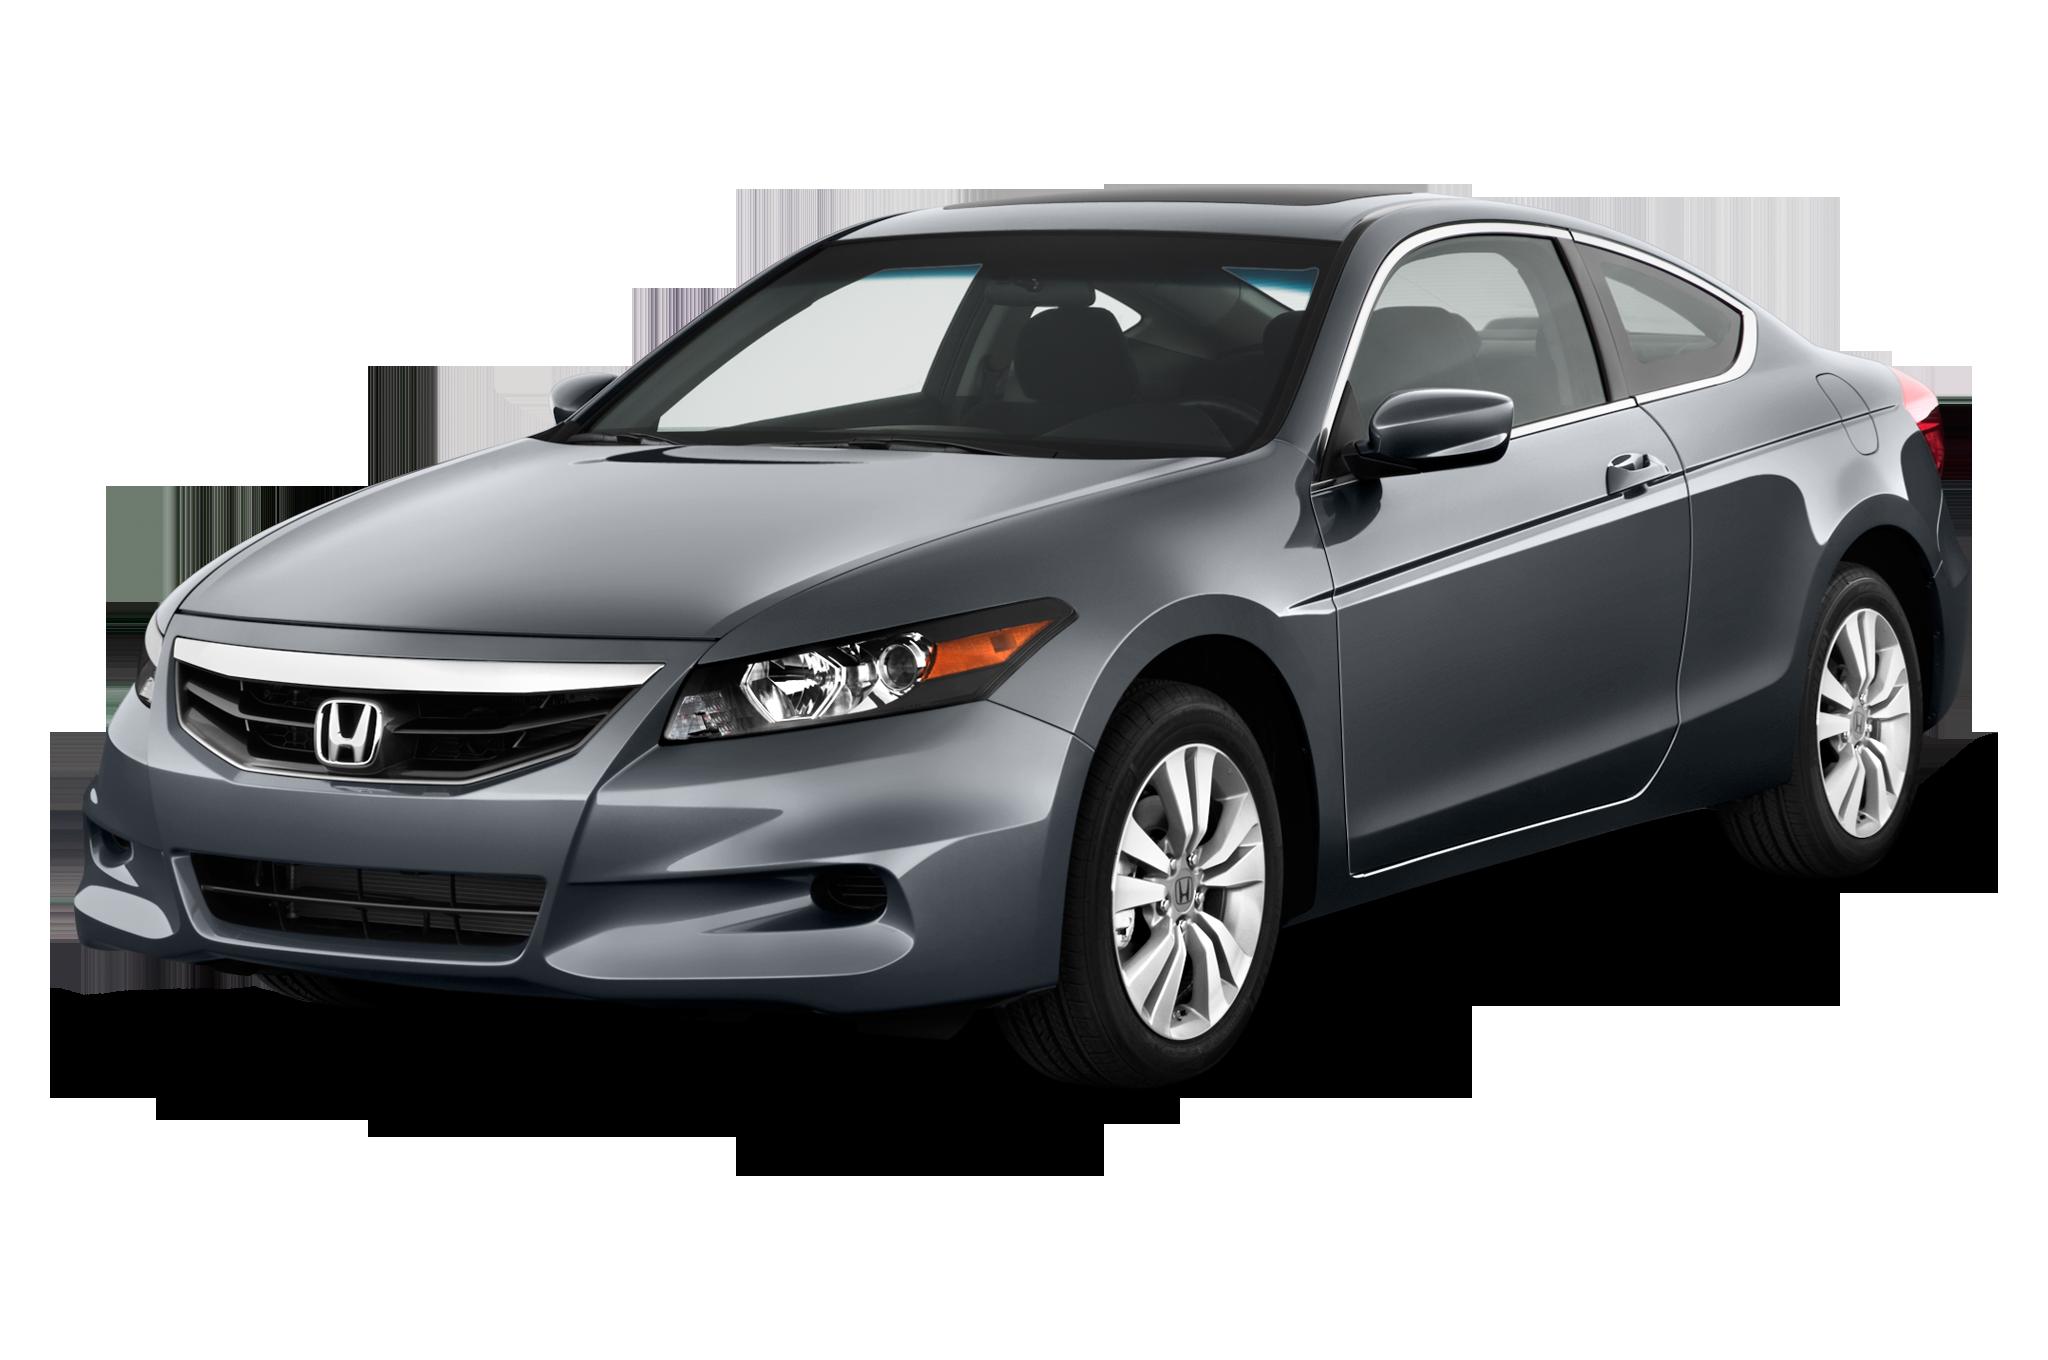 Honda ACCORD EX L V6 2012 International Price & Overview